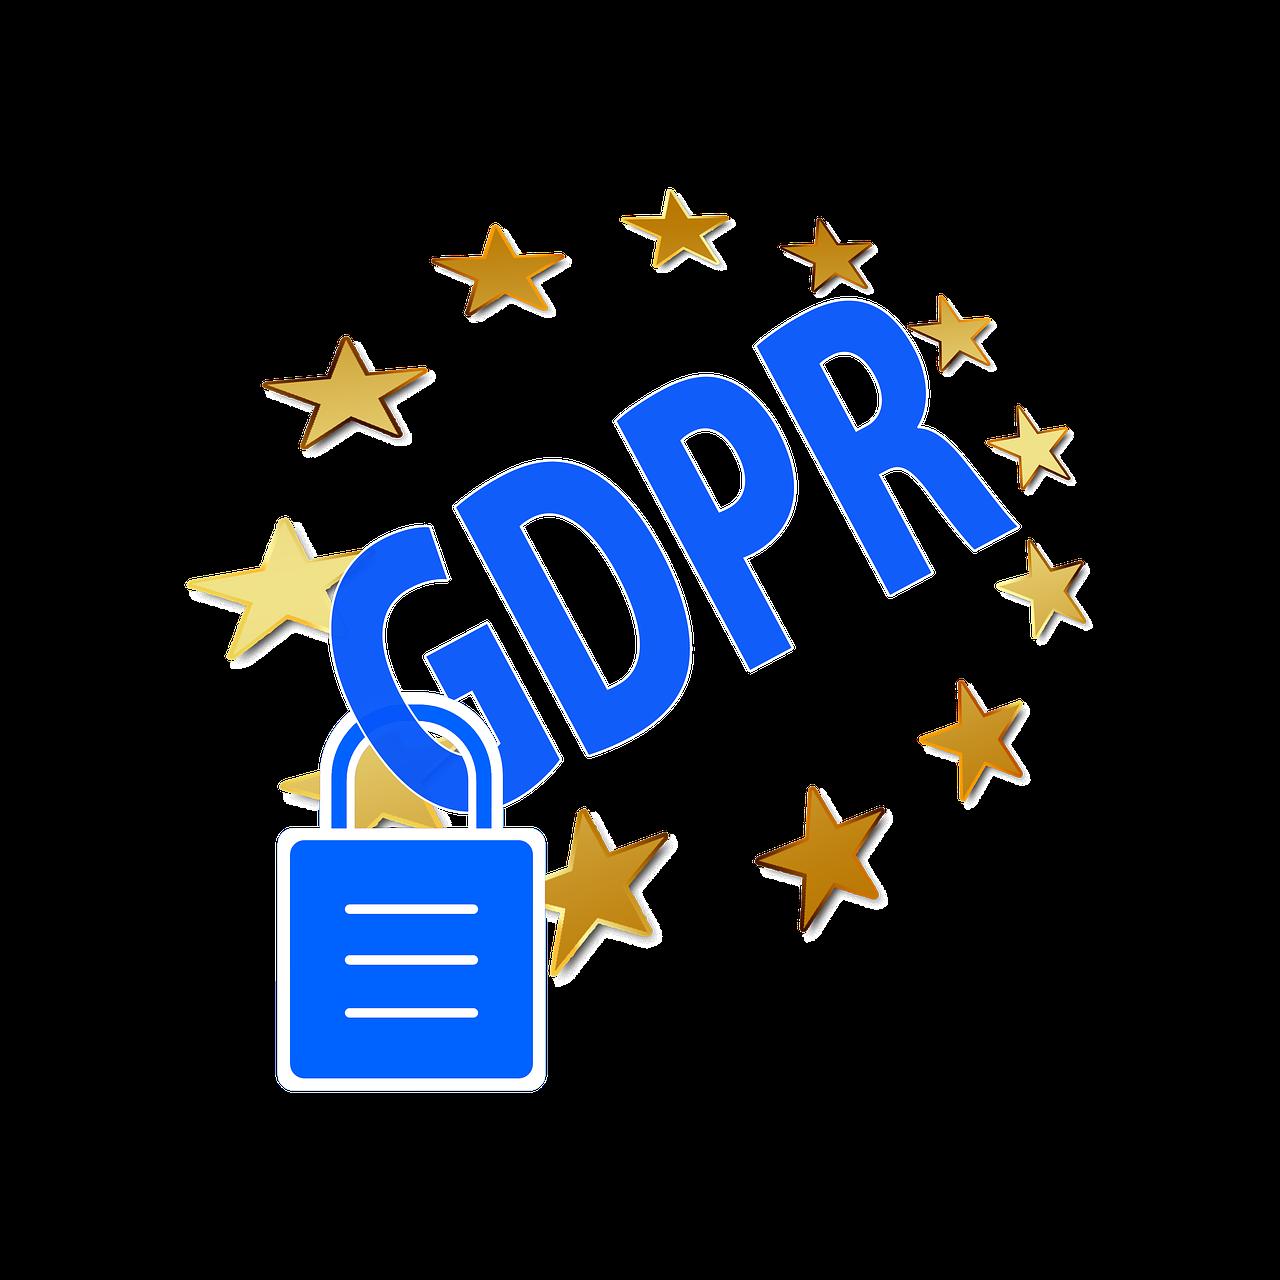 GDPR – What Happens Next?